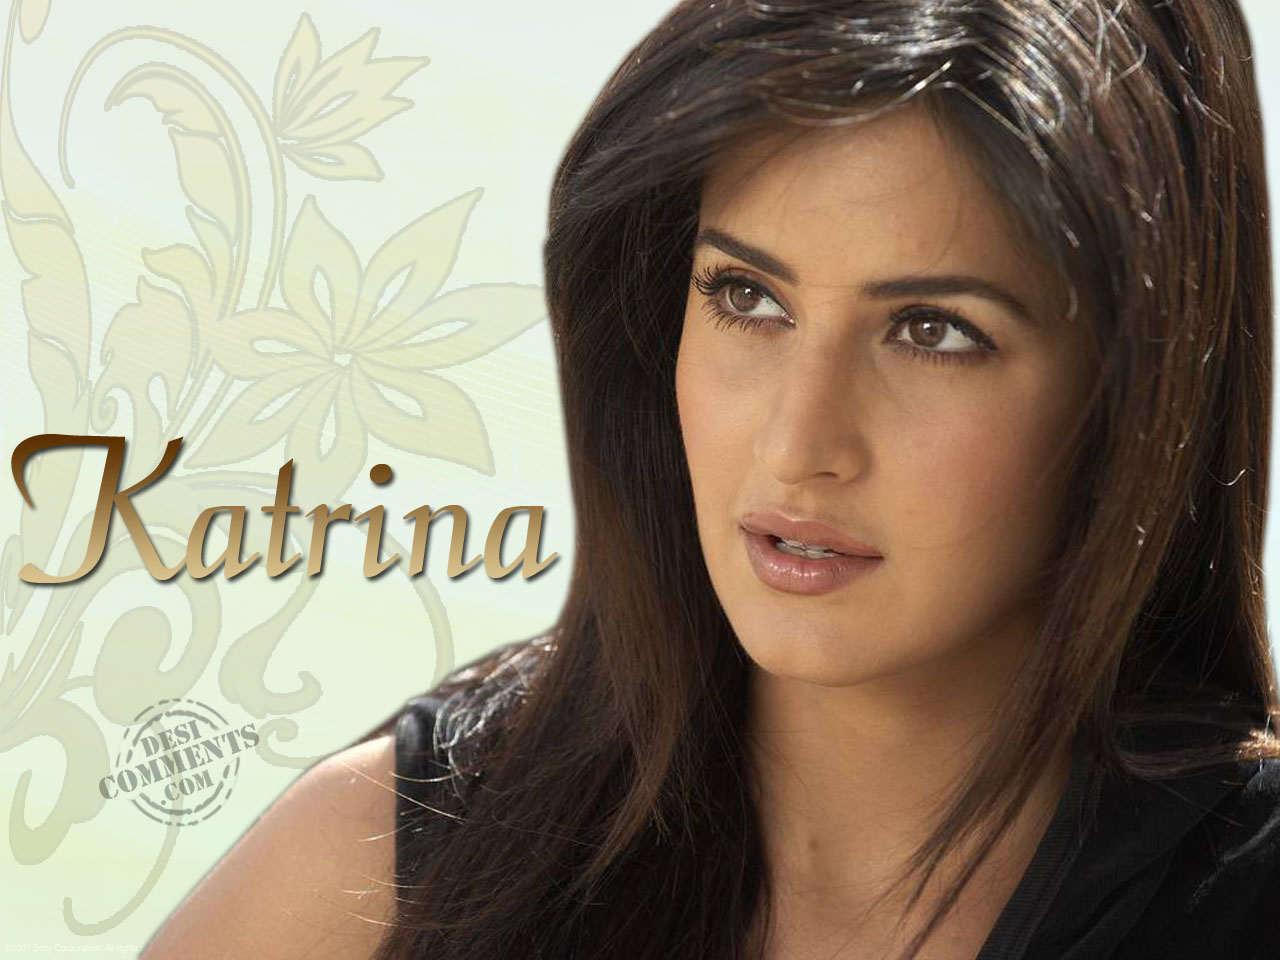 Katrina Kaif Cute Wallpapers 1280x960